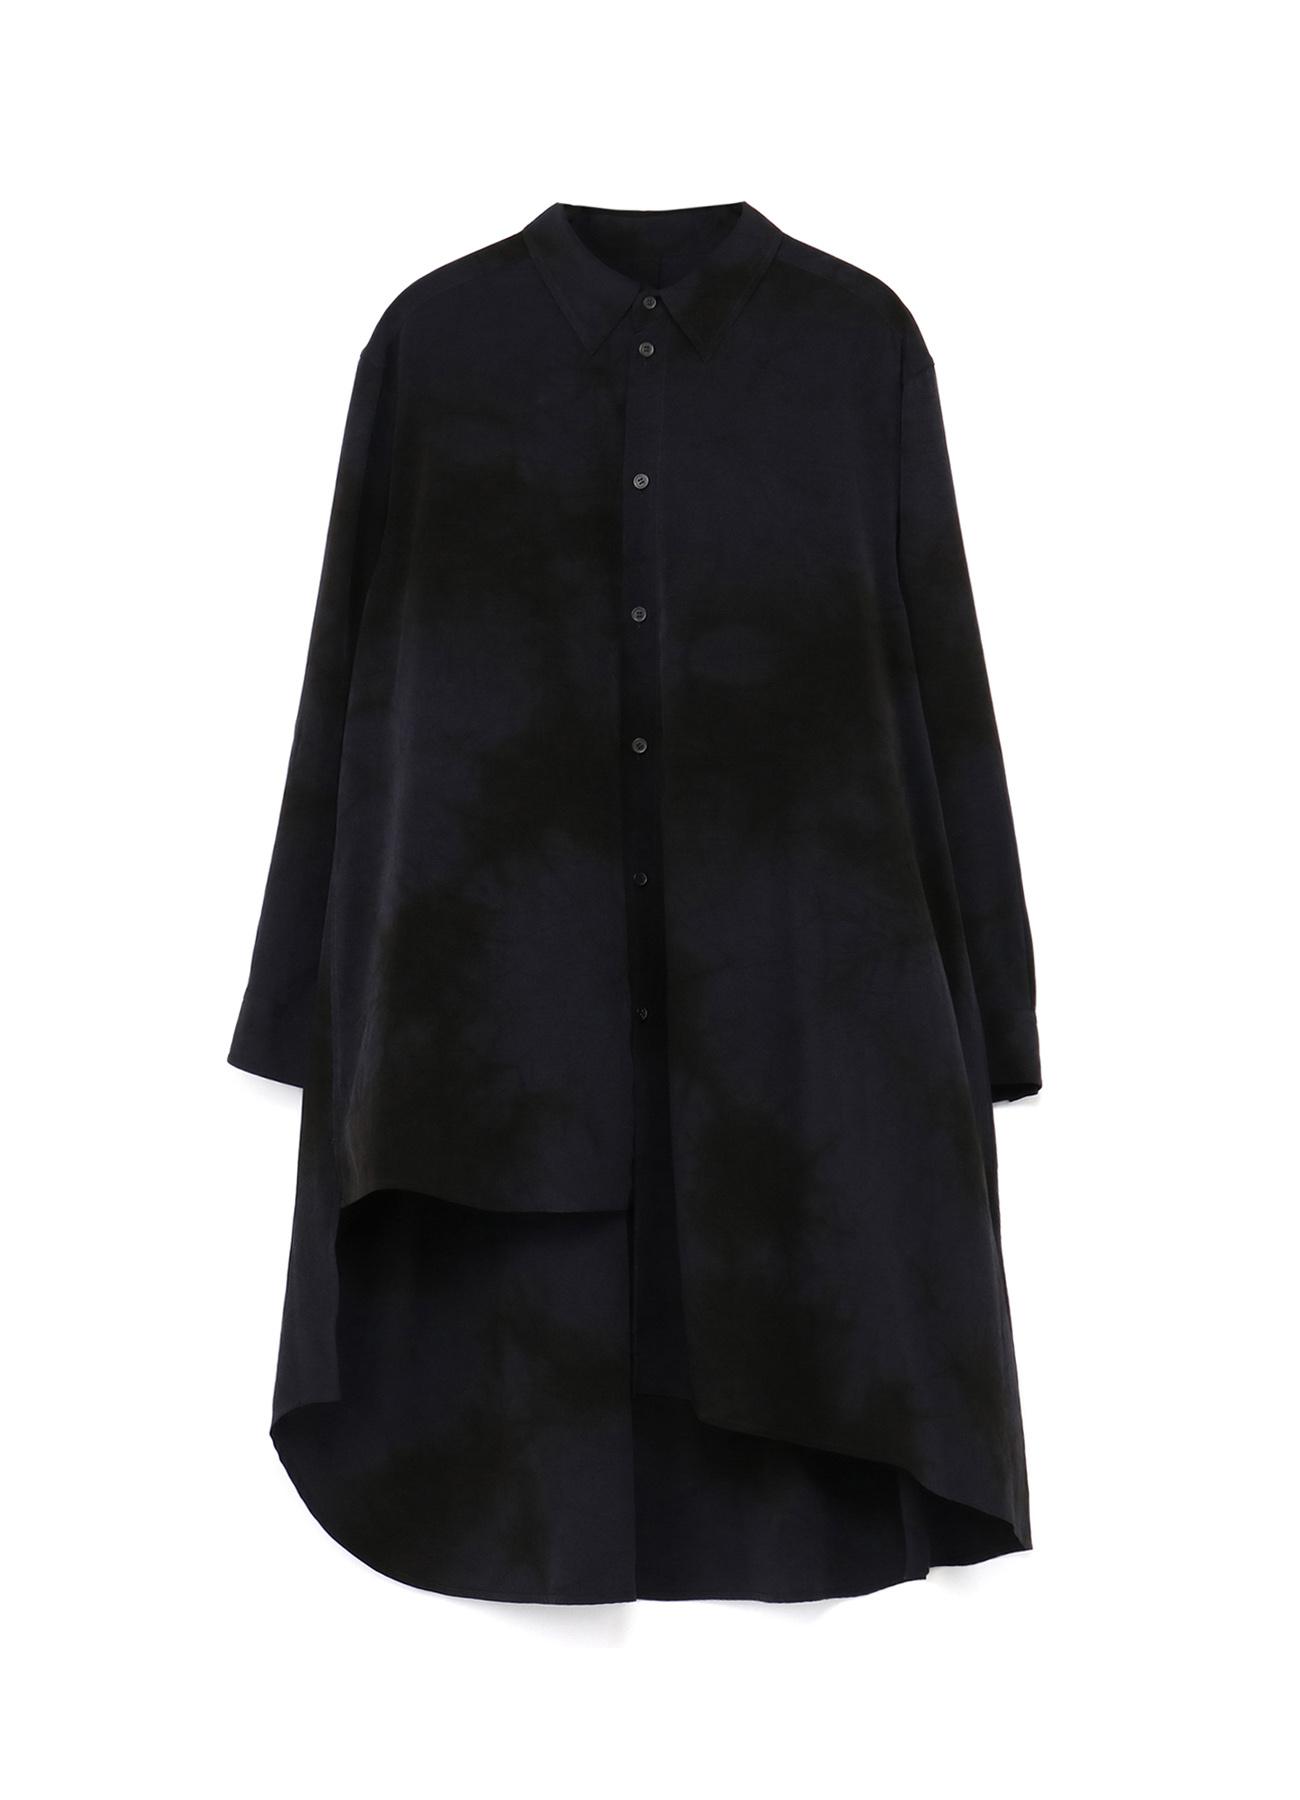 T/A Vintage Decyne Uneven Dyeing Big Asymmetric Shirt